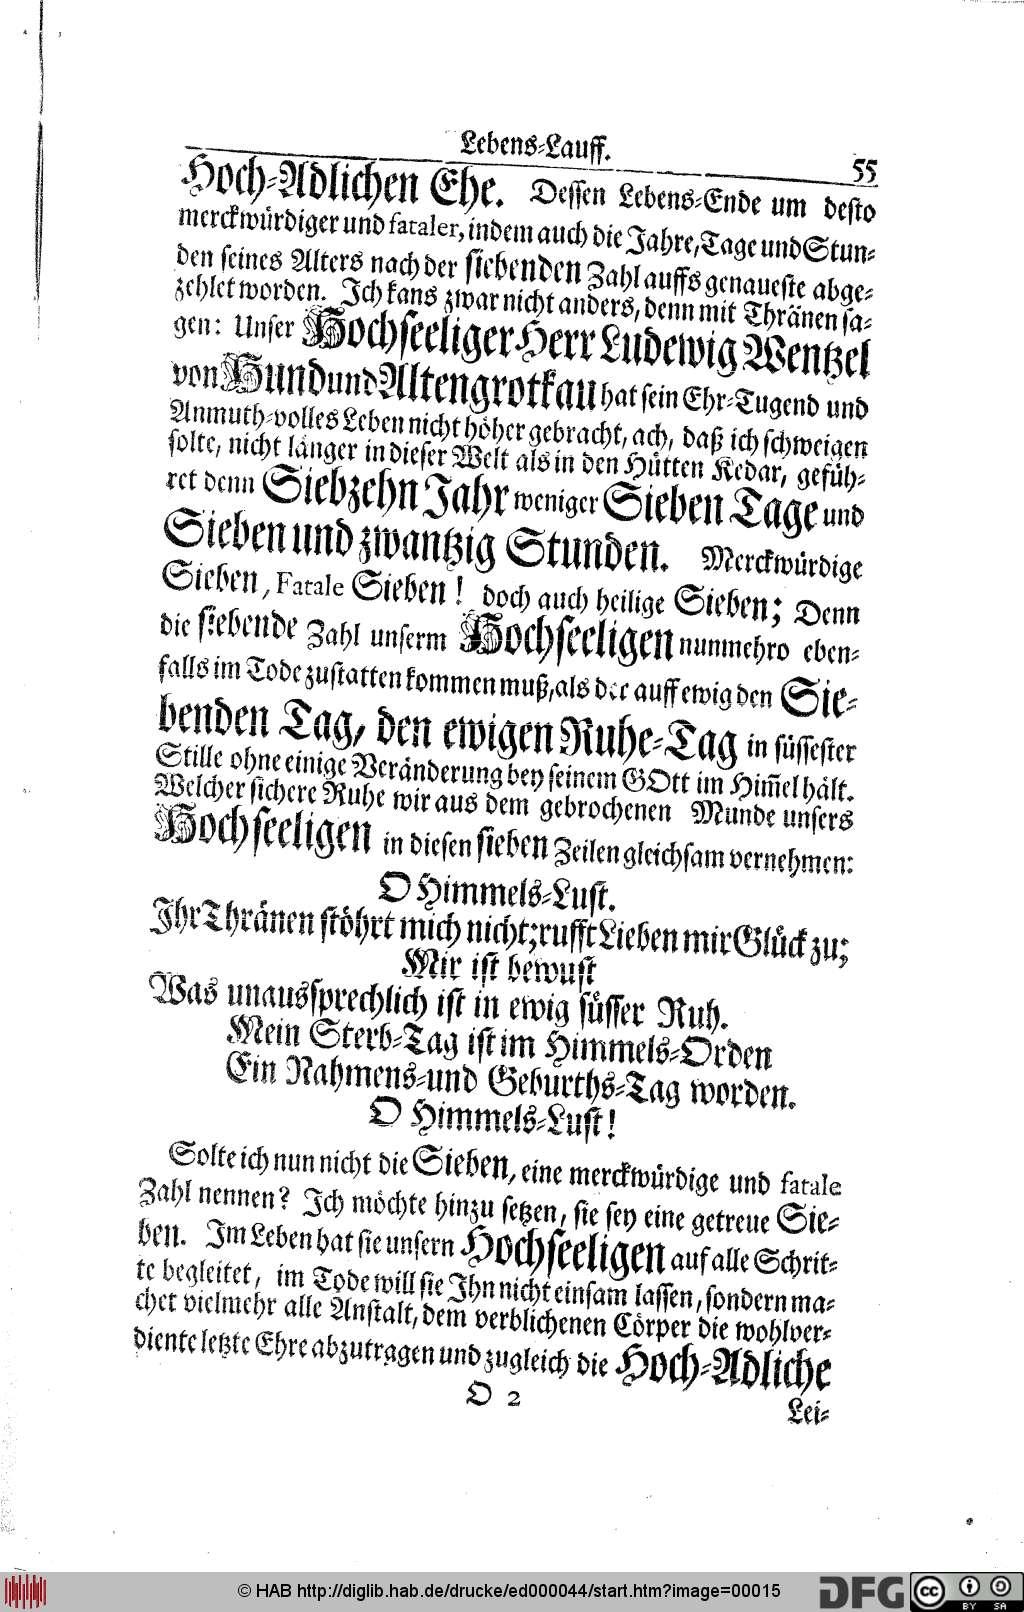 http://diglib.hab.de/drucke/ed000044/00015.jpg